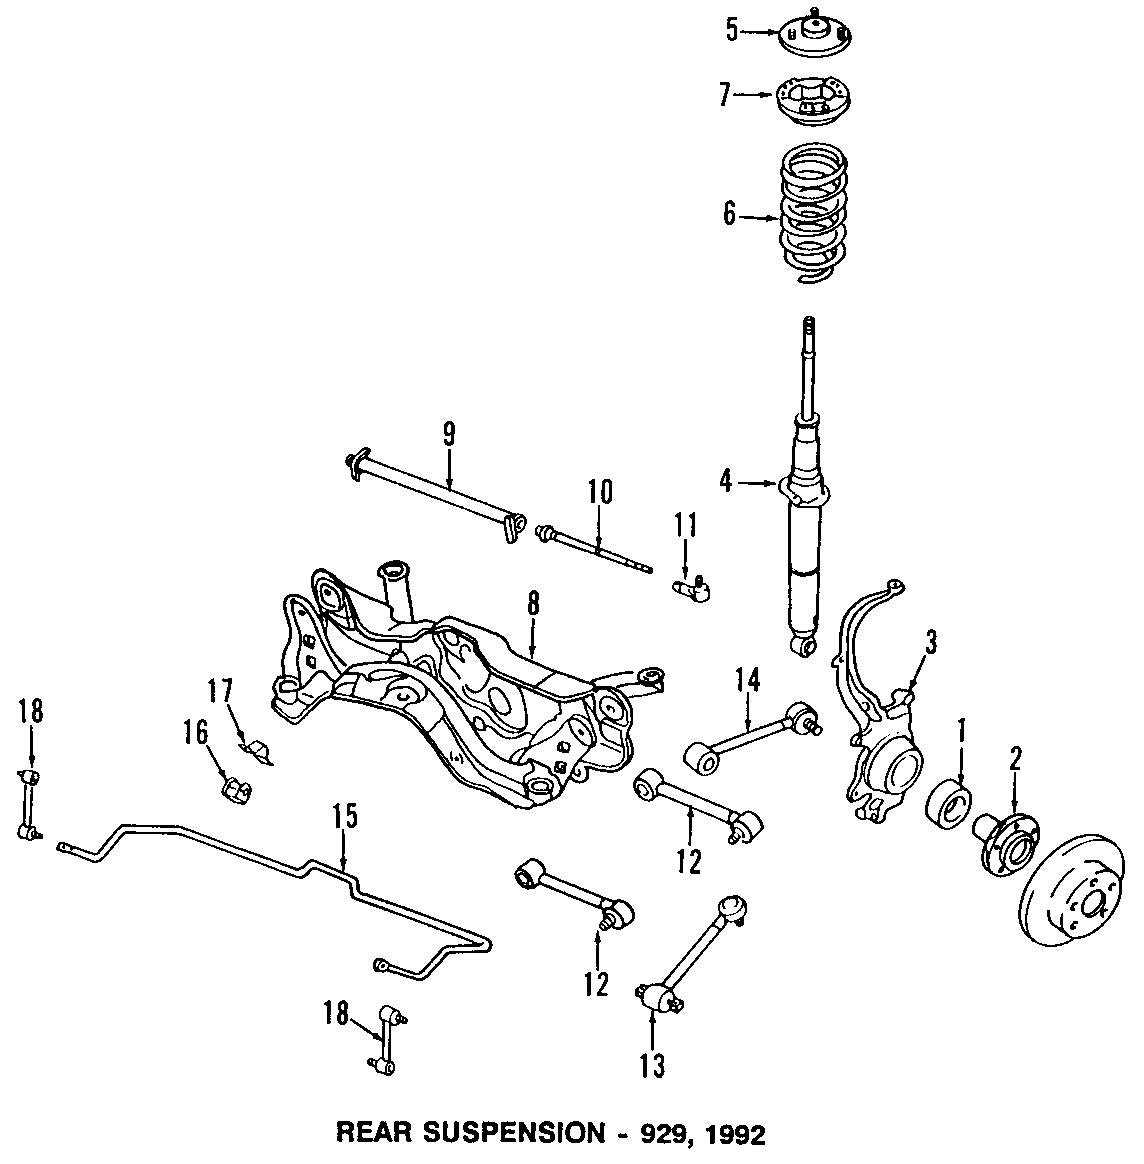 Mazda 929 Suspension Stabilizer Bar Bushing  Components  Clank  Make